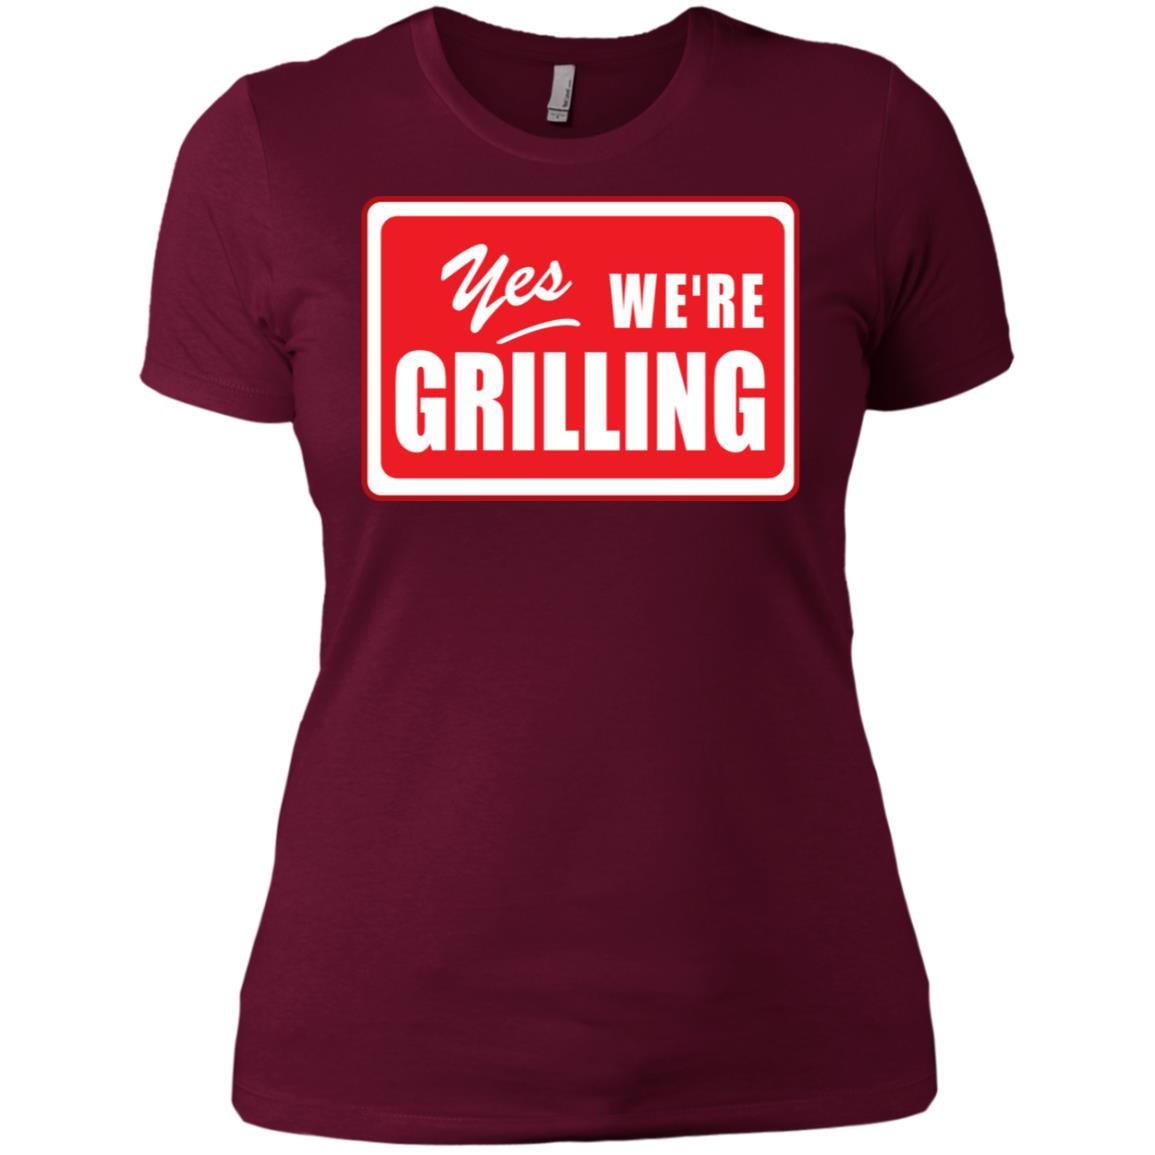 Bbq Grillings for chefs & cooks Women Short Sleeve